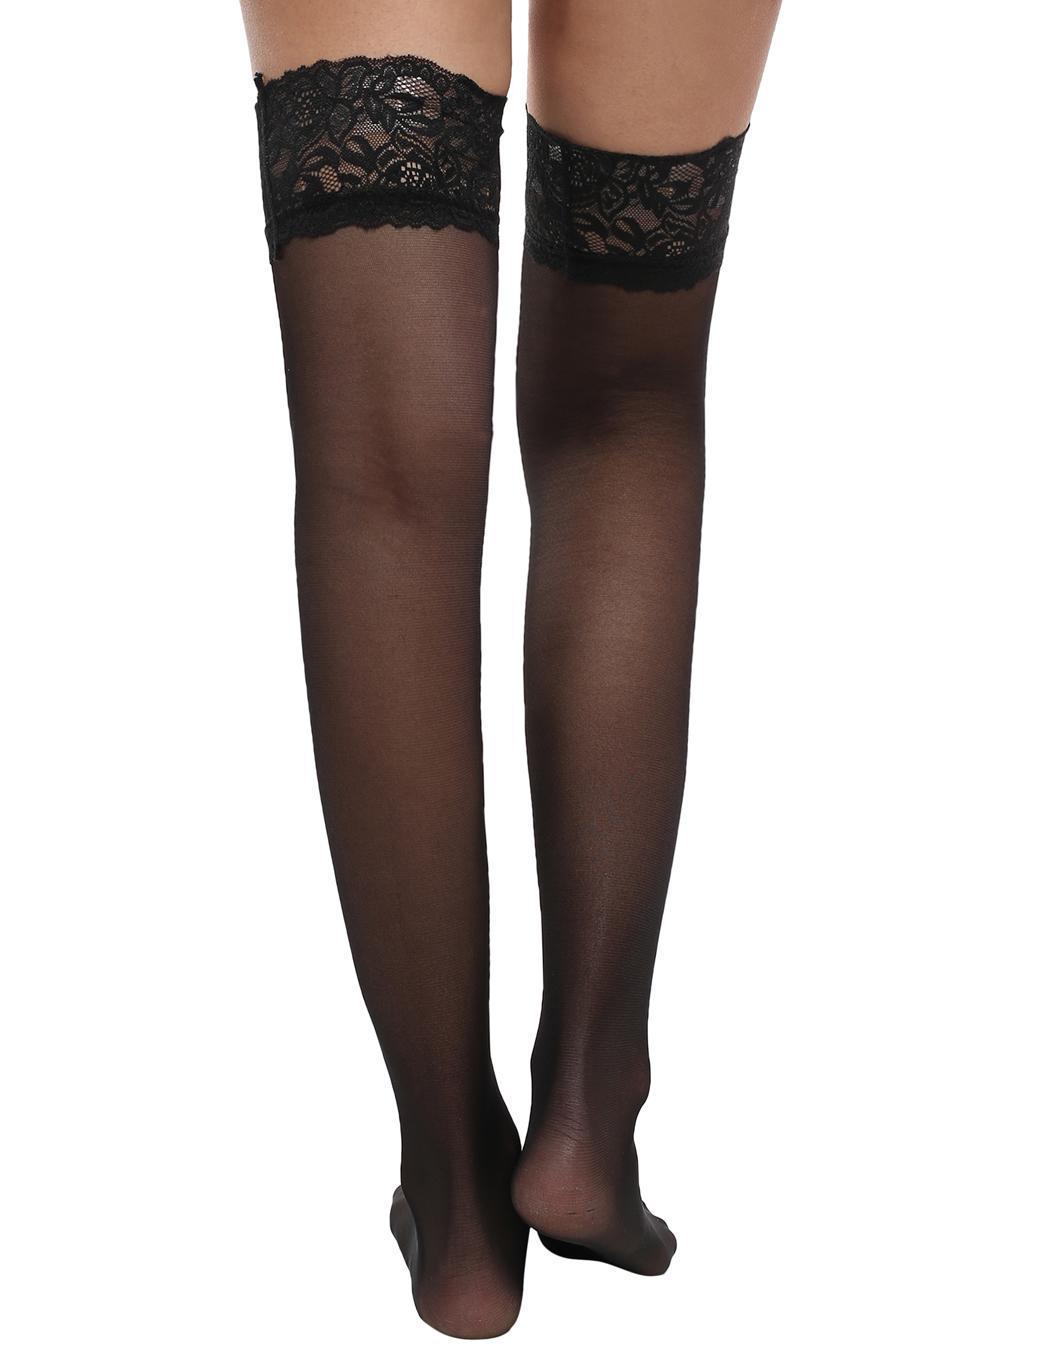 da620a9be Avidlove Women Silk Reflections Lace Top Sheer Thigh High Stockings ...